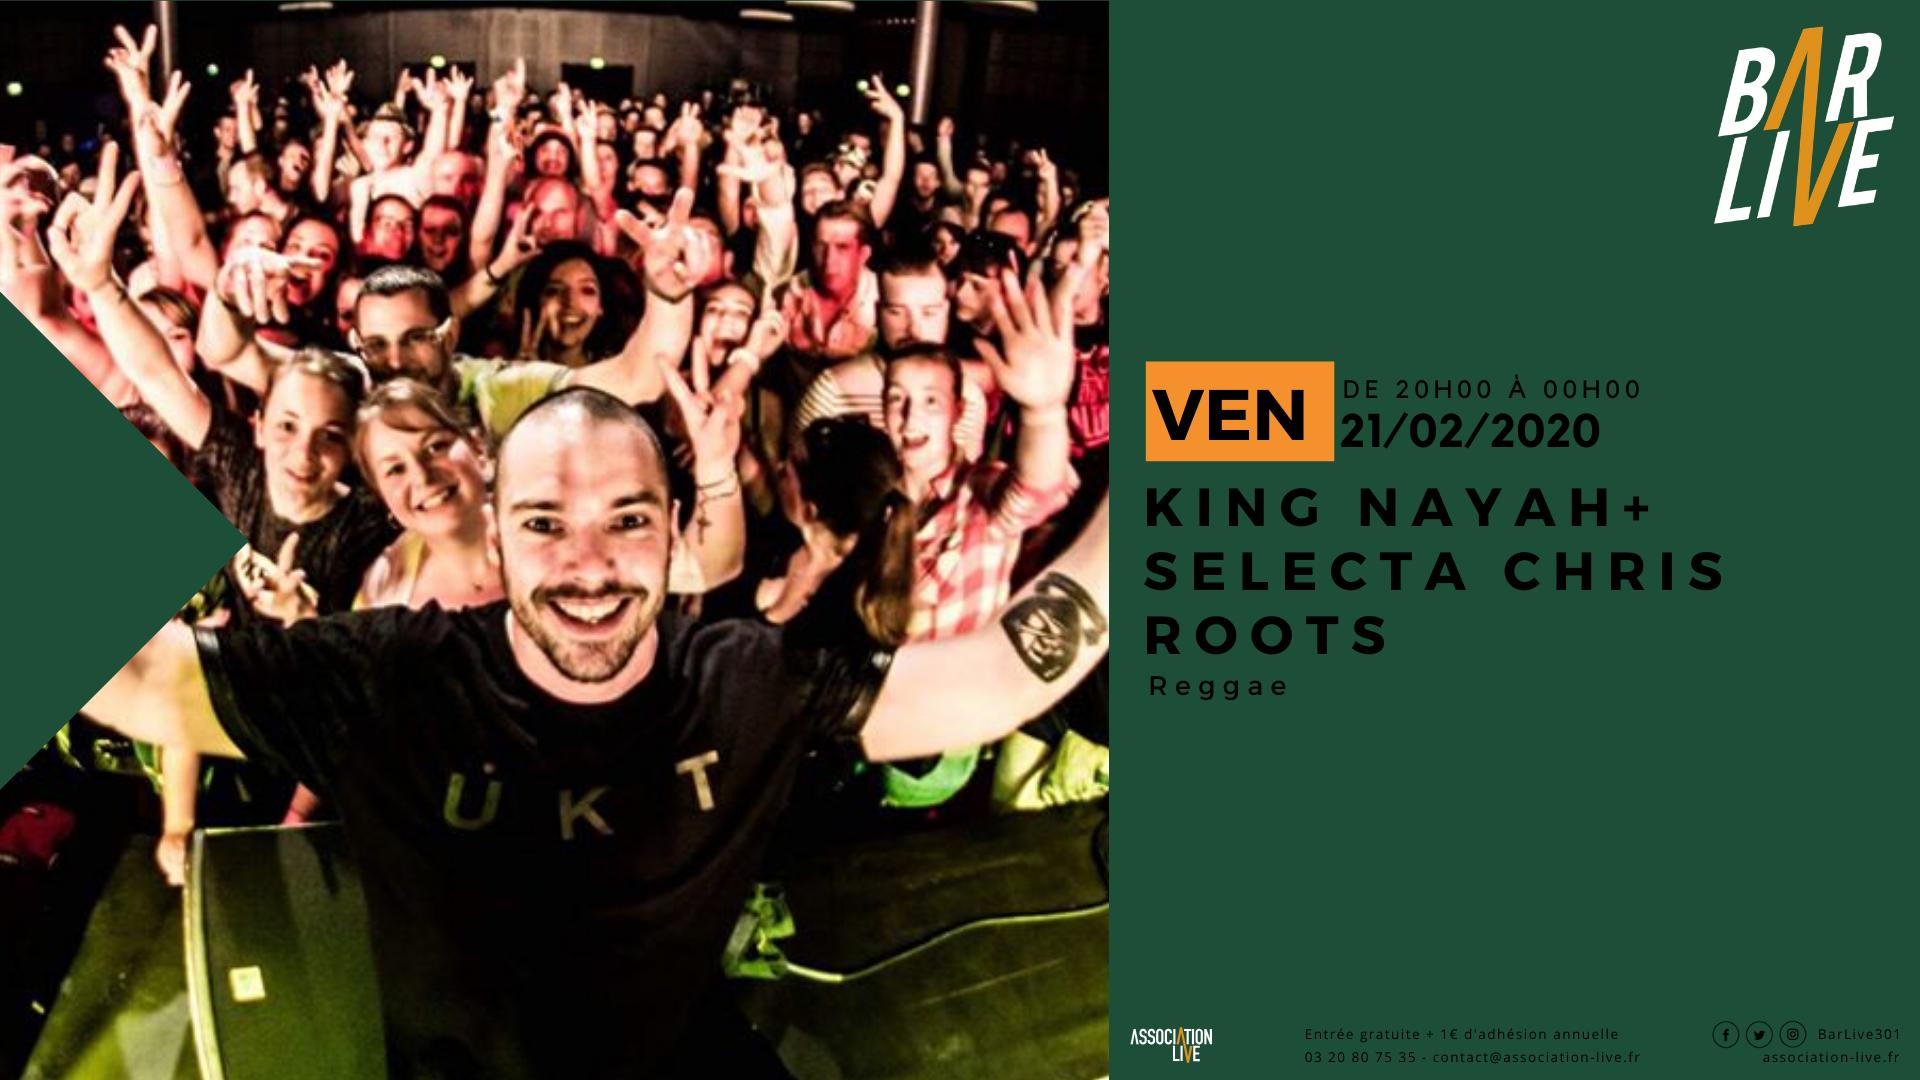 King Nayah + Selecta Chris Roots